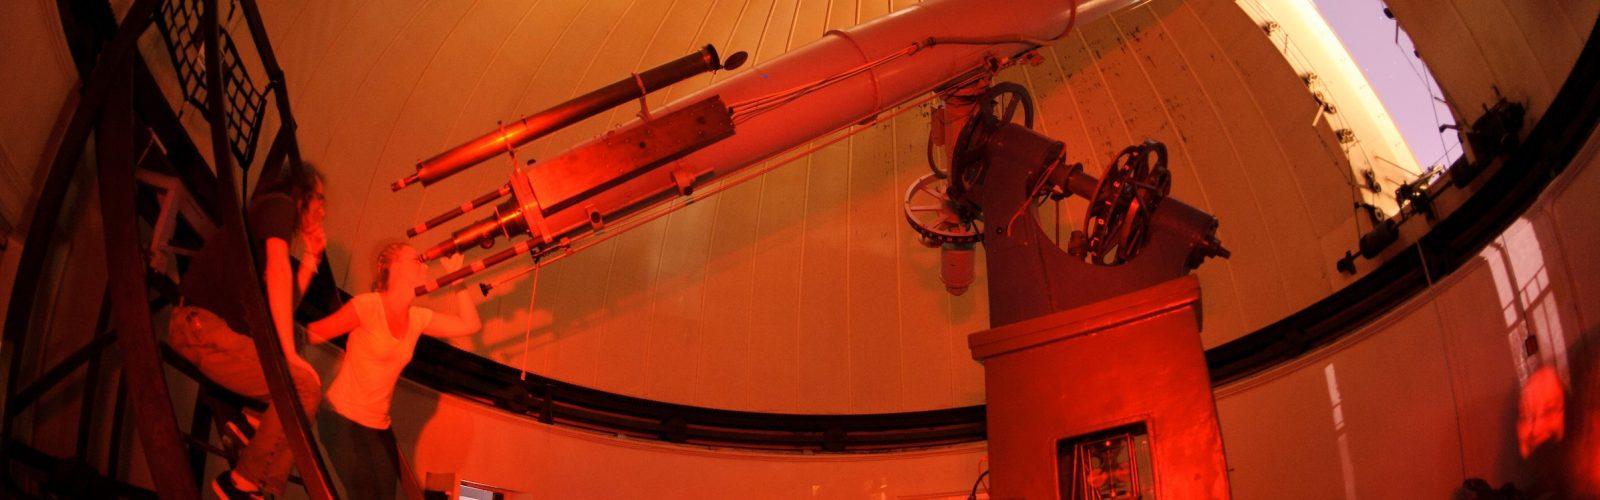 Using the telescope inside Washburn Observatory